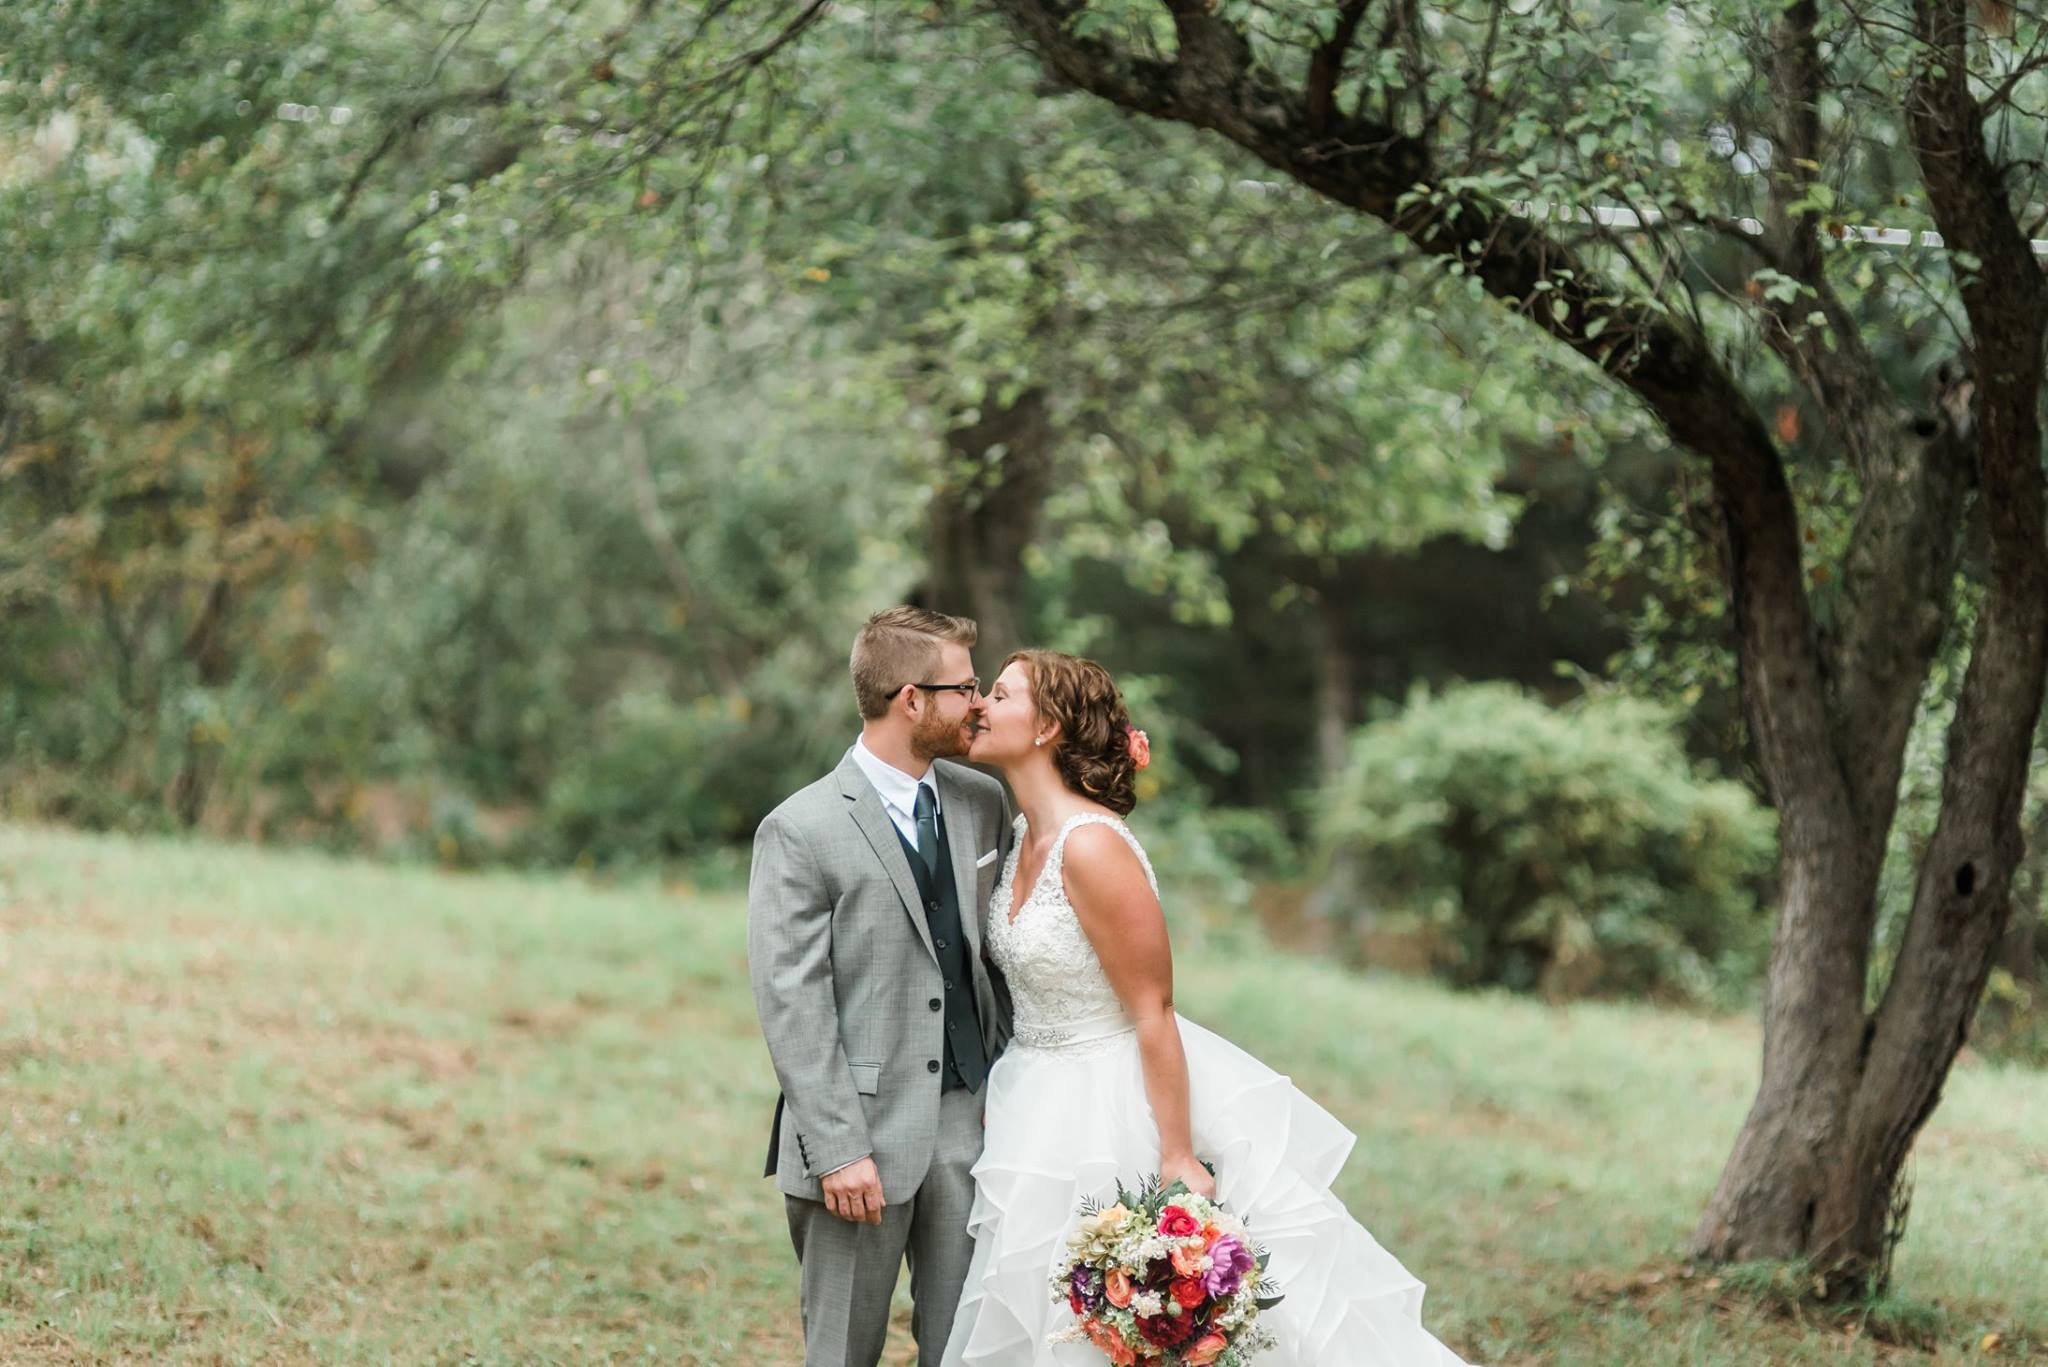 pennsylvania-backyard-wedding-love-diy-bohemian-romantic-colorful-0014.jpg